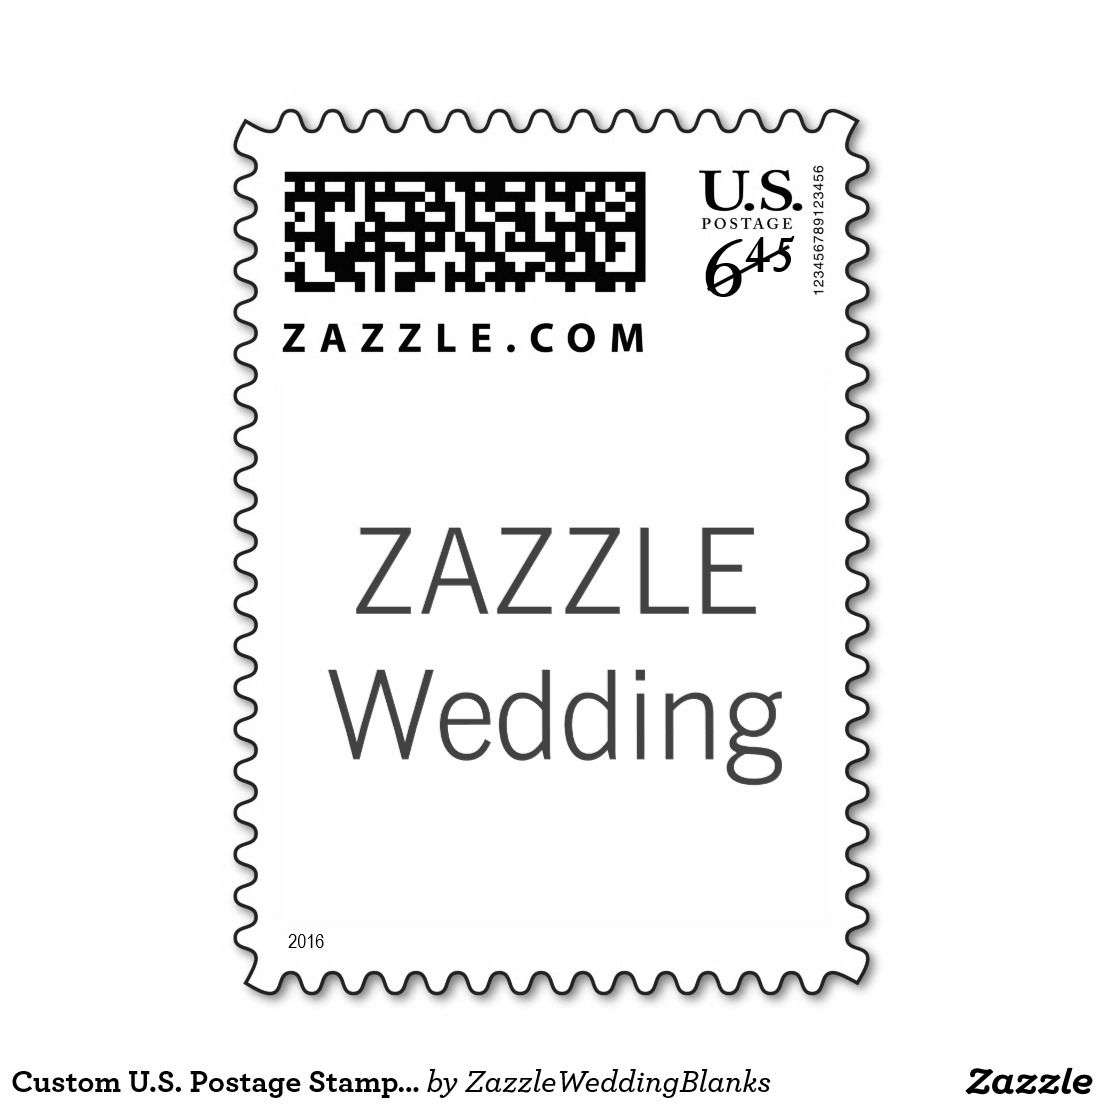 Custom us postage stamp 1st class priority